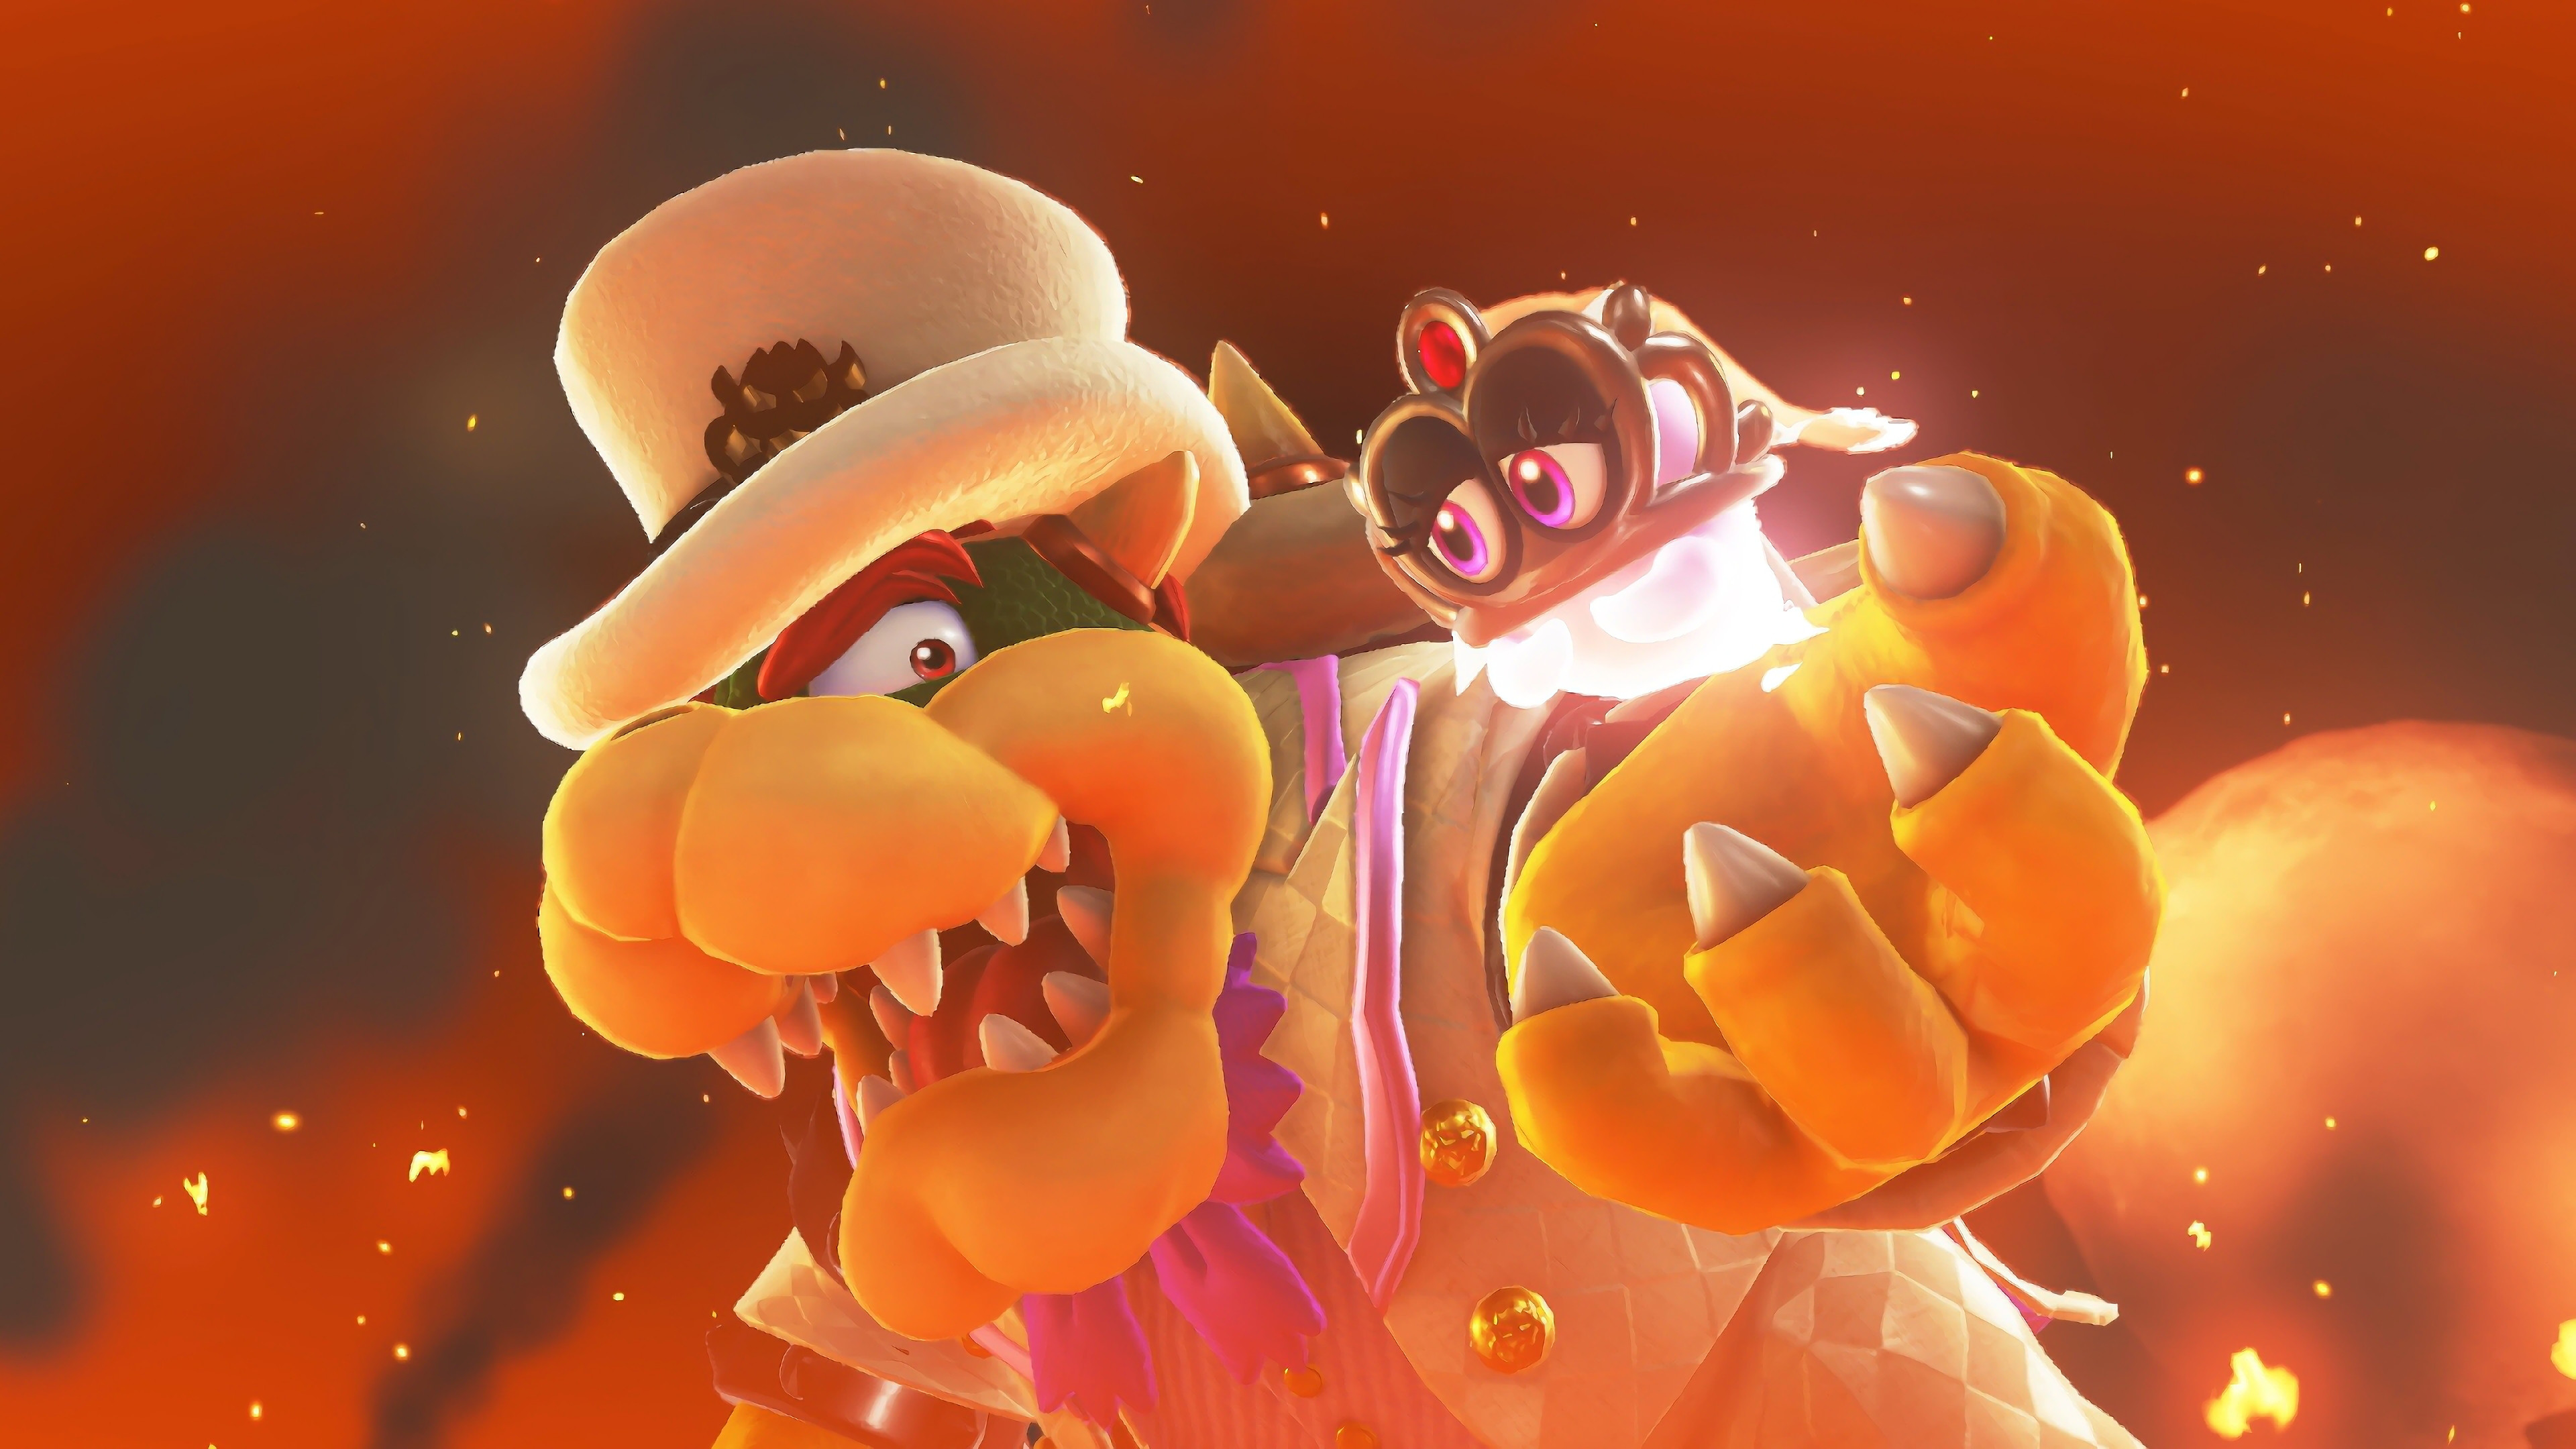 Res: 3840x2160, Super Mario Odyssey Bowser & Tiara Wallpaper